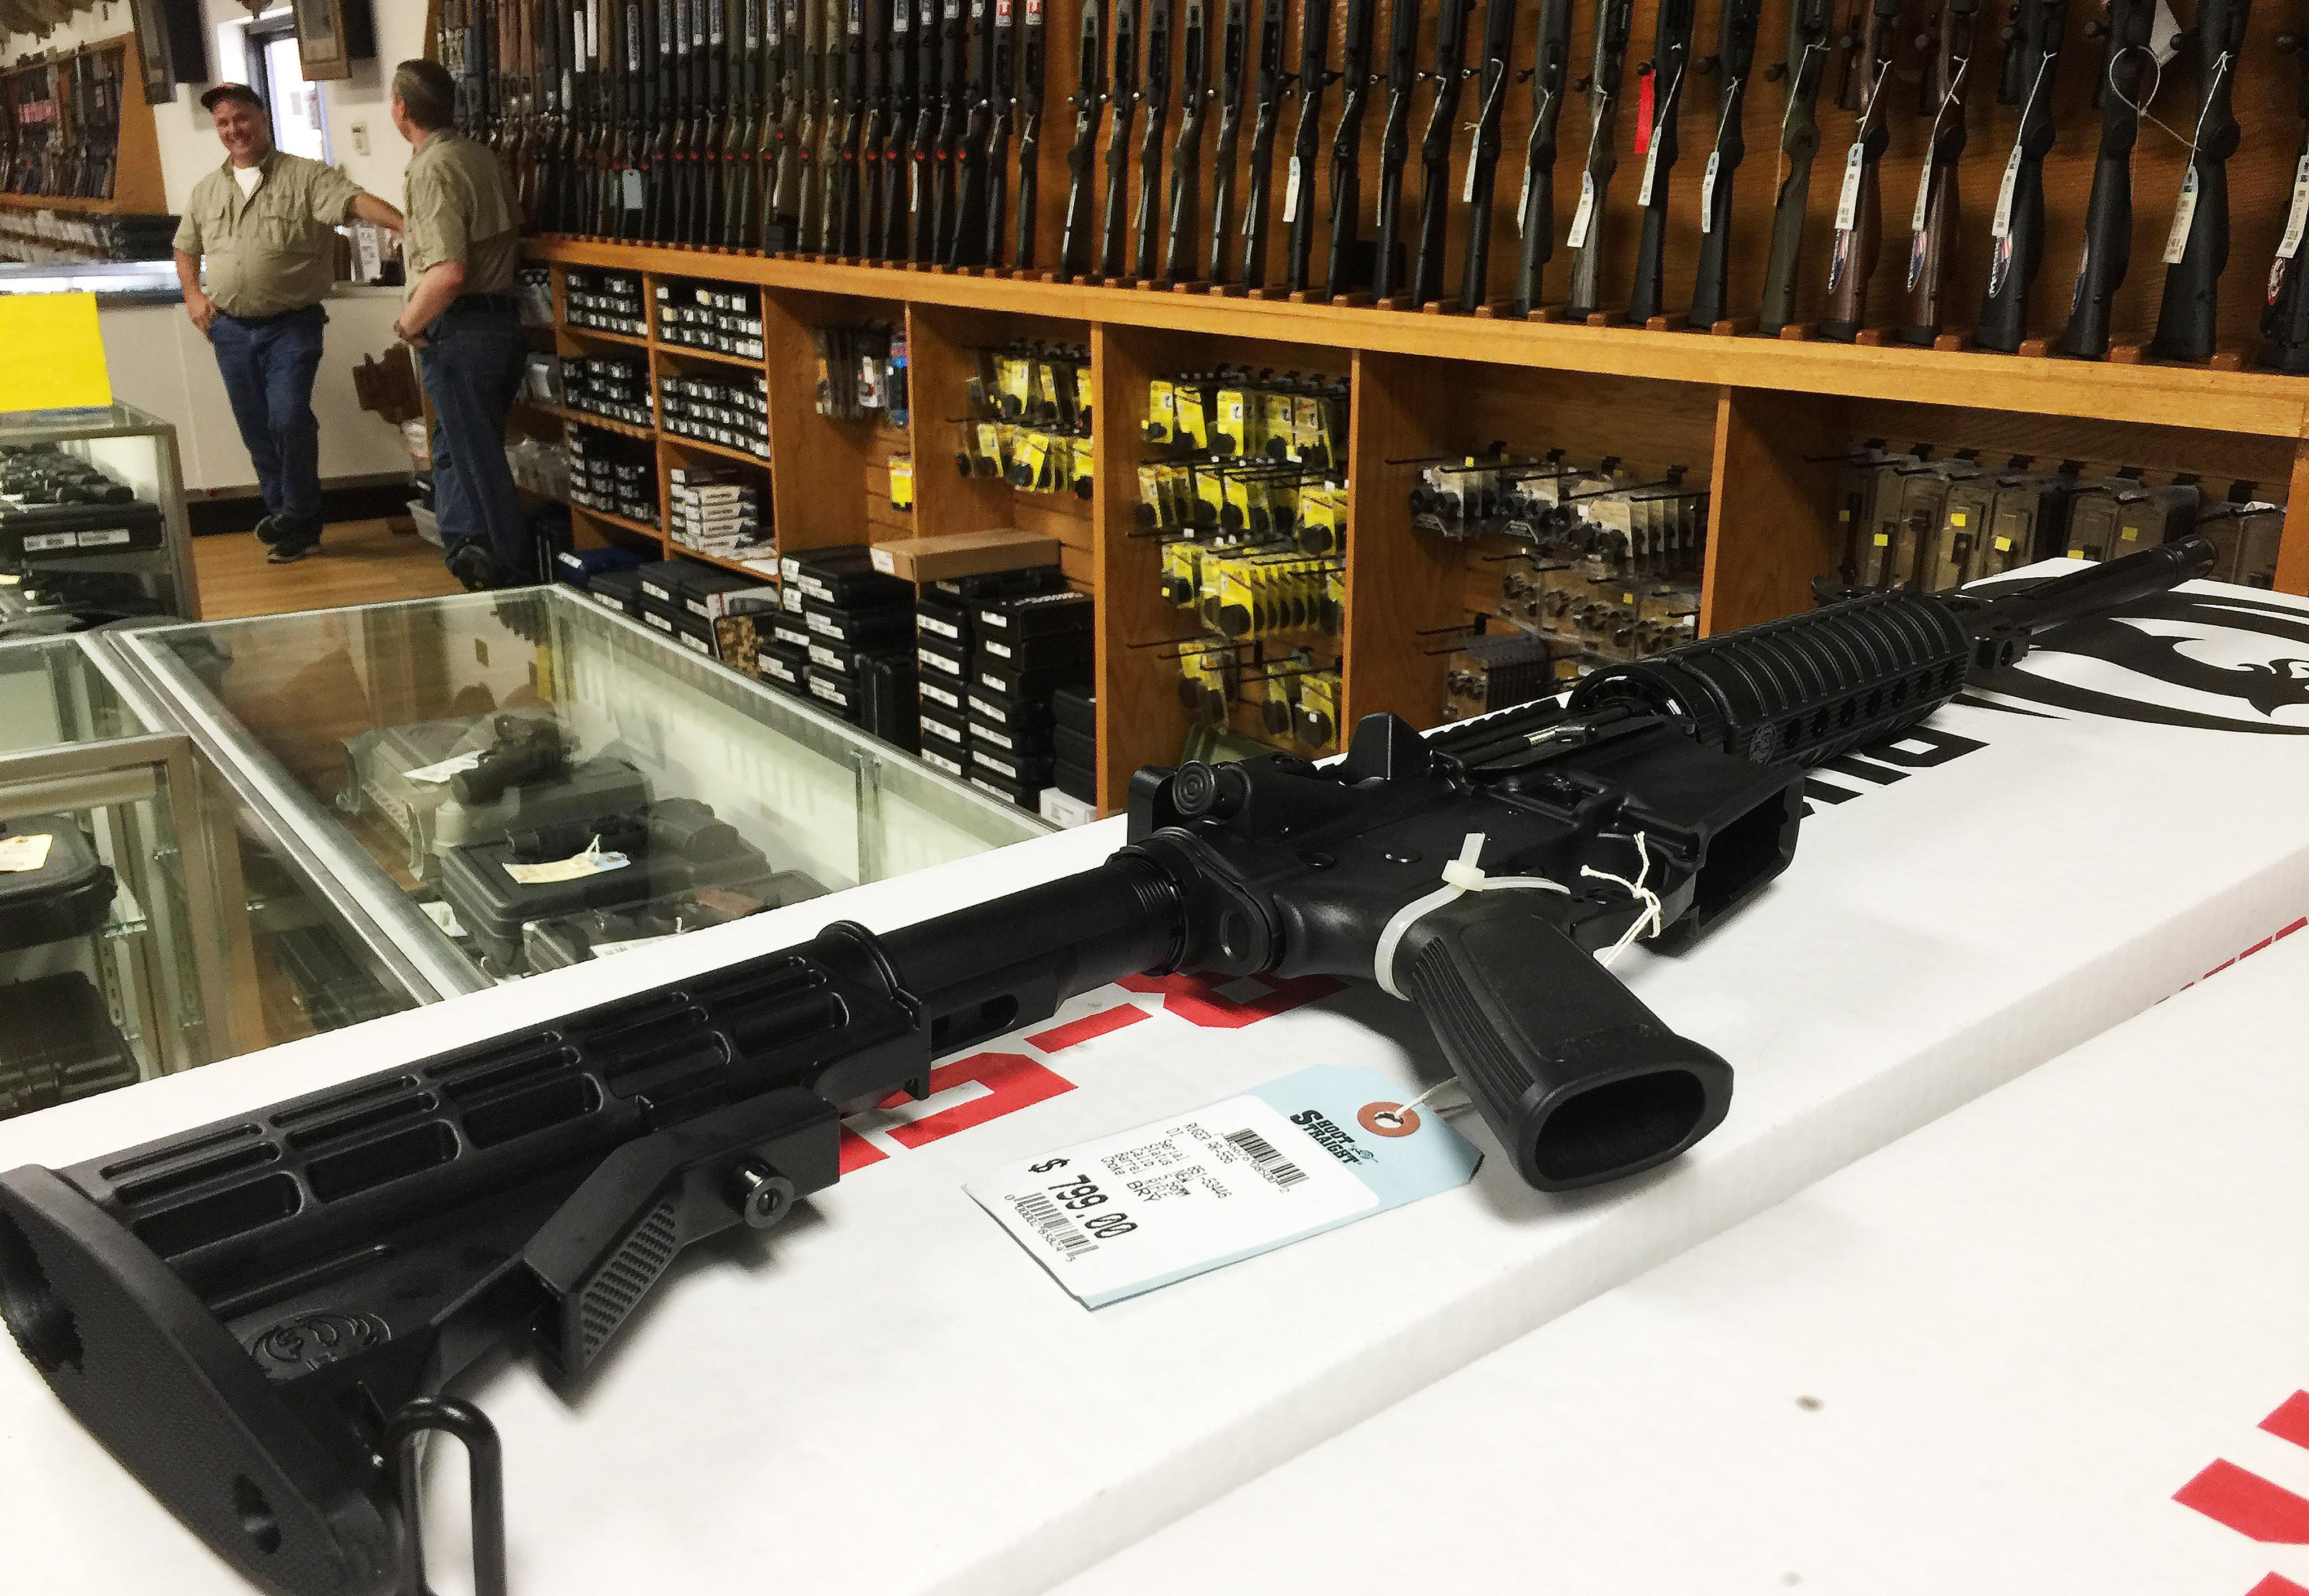 An AR-15 semi-automatic weapon. Credit: PA